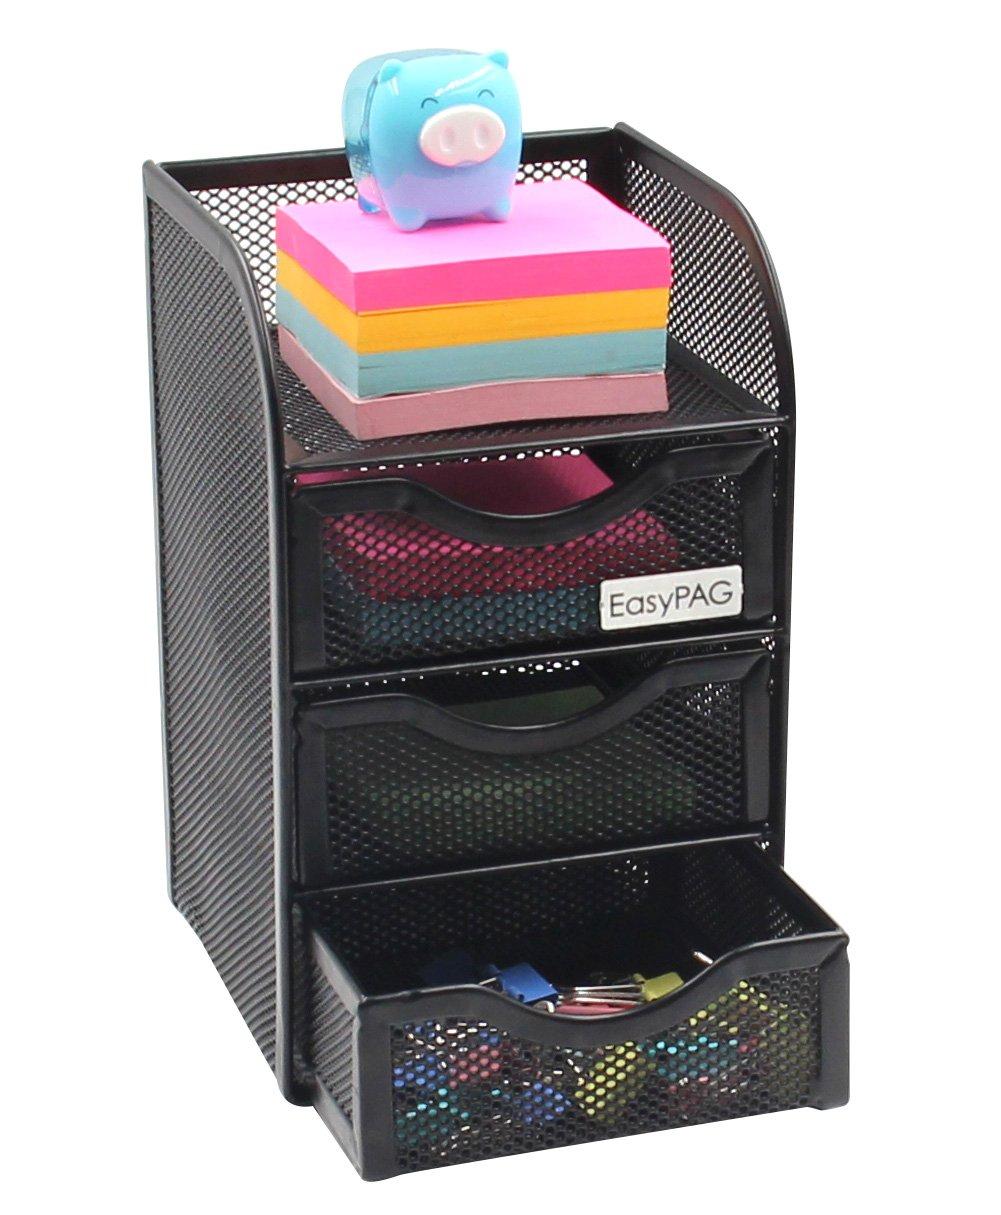 amazoncom easypag mesh cute desk accessories organizer caddy 3 drawer mini hutch black office products